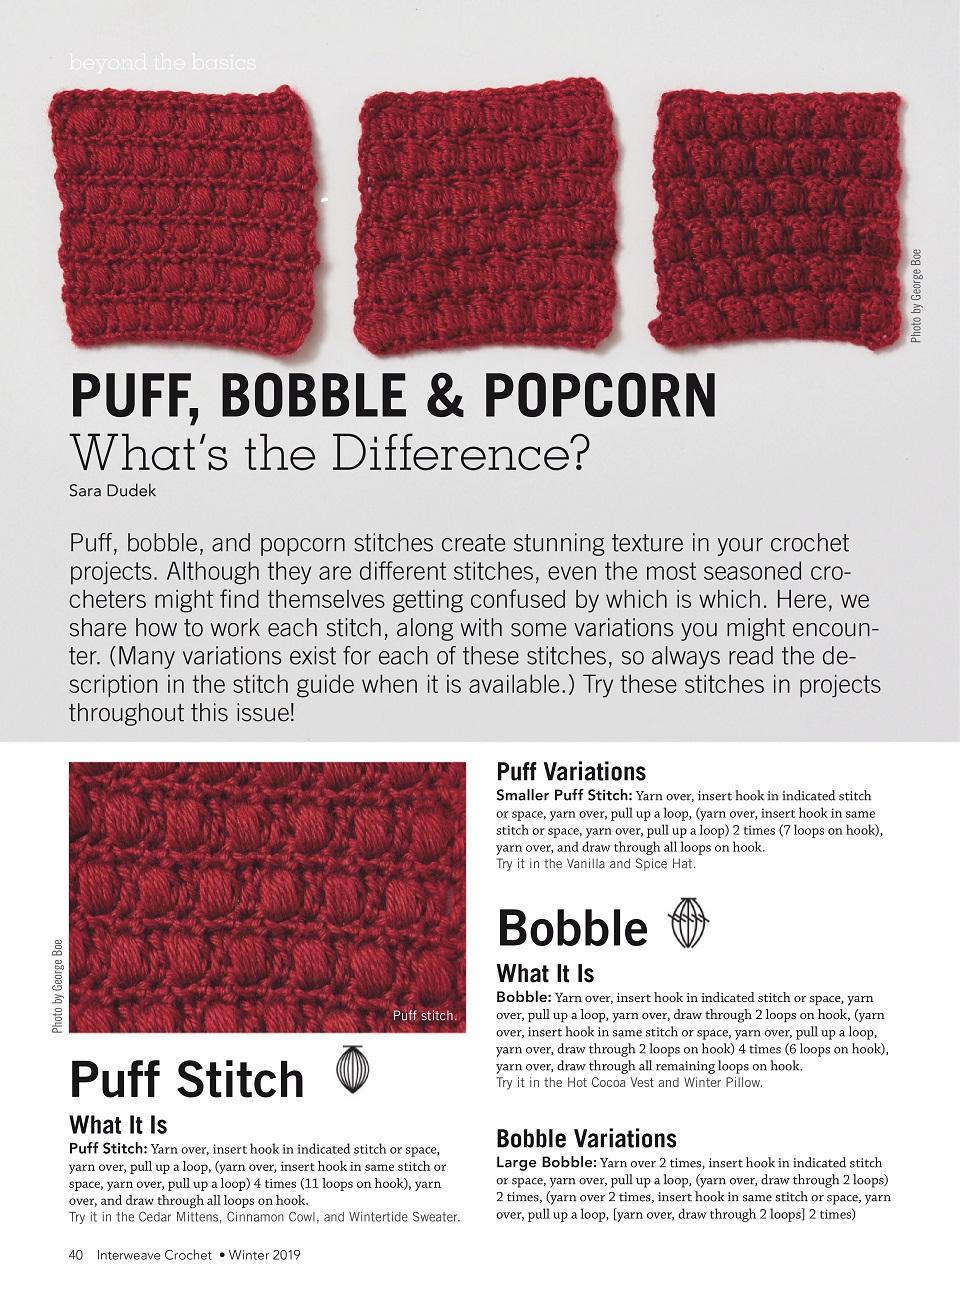 Interweave Crochet Winter 2019-41